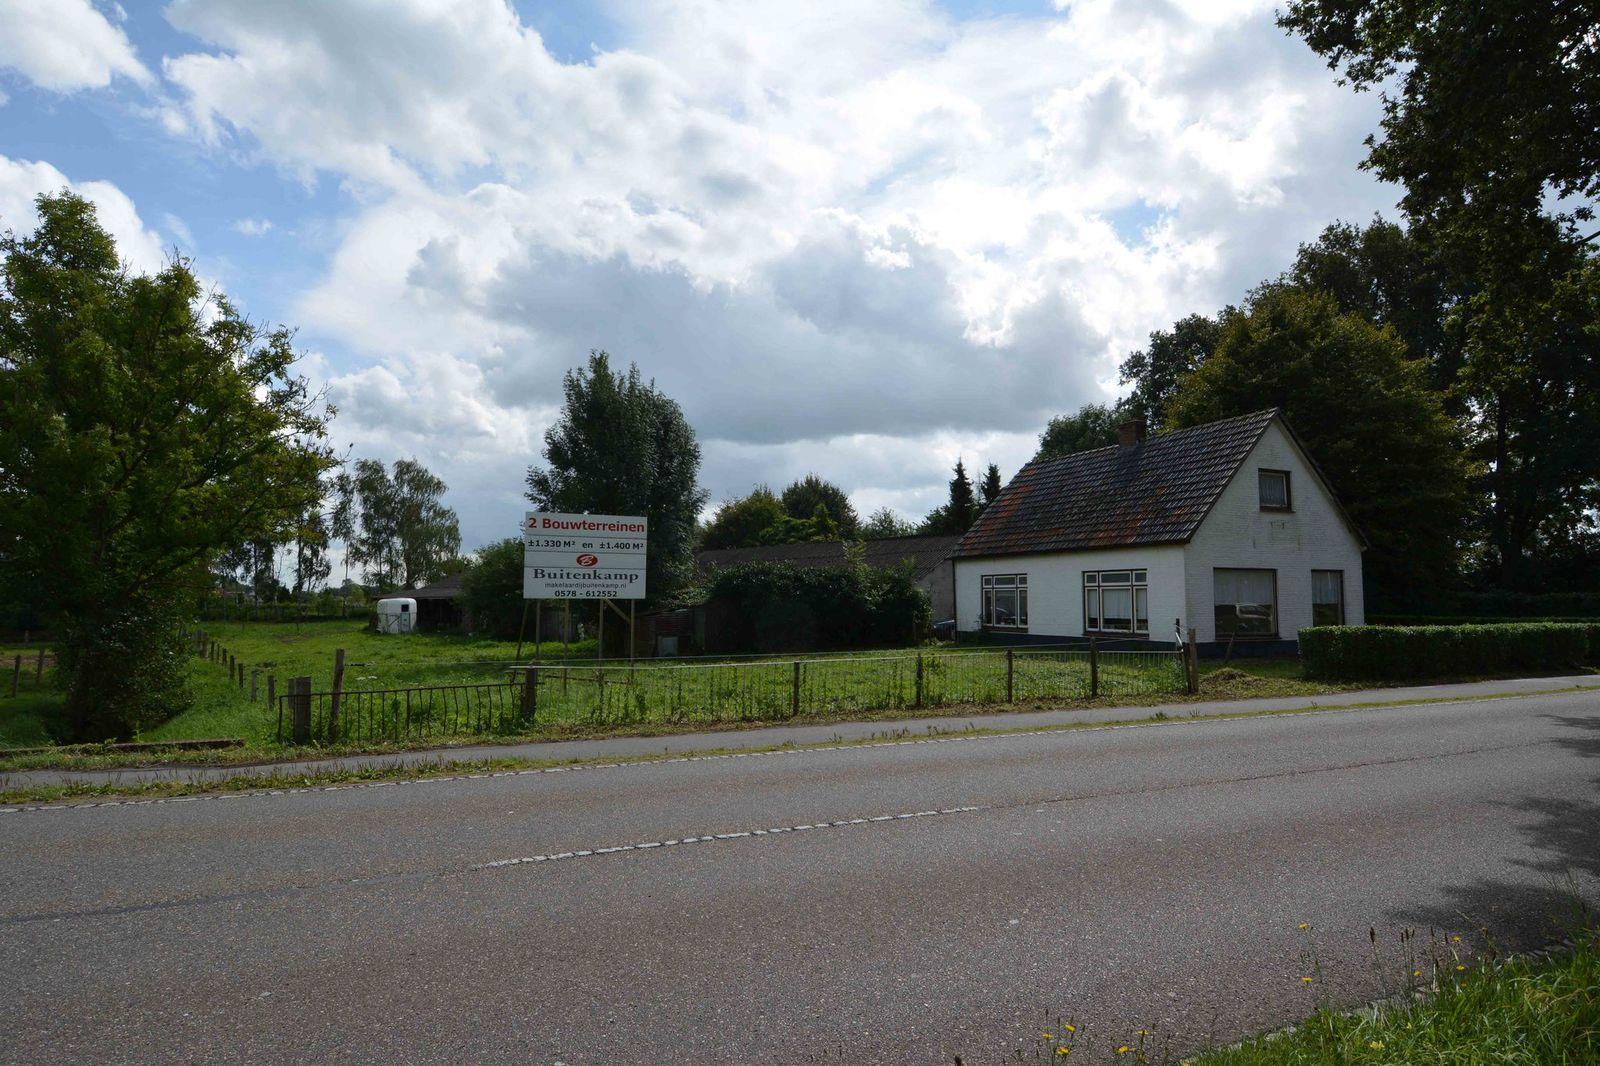 Apeldoornseweg 145, Vaassen